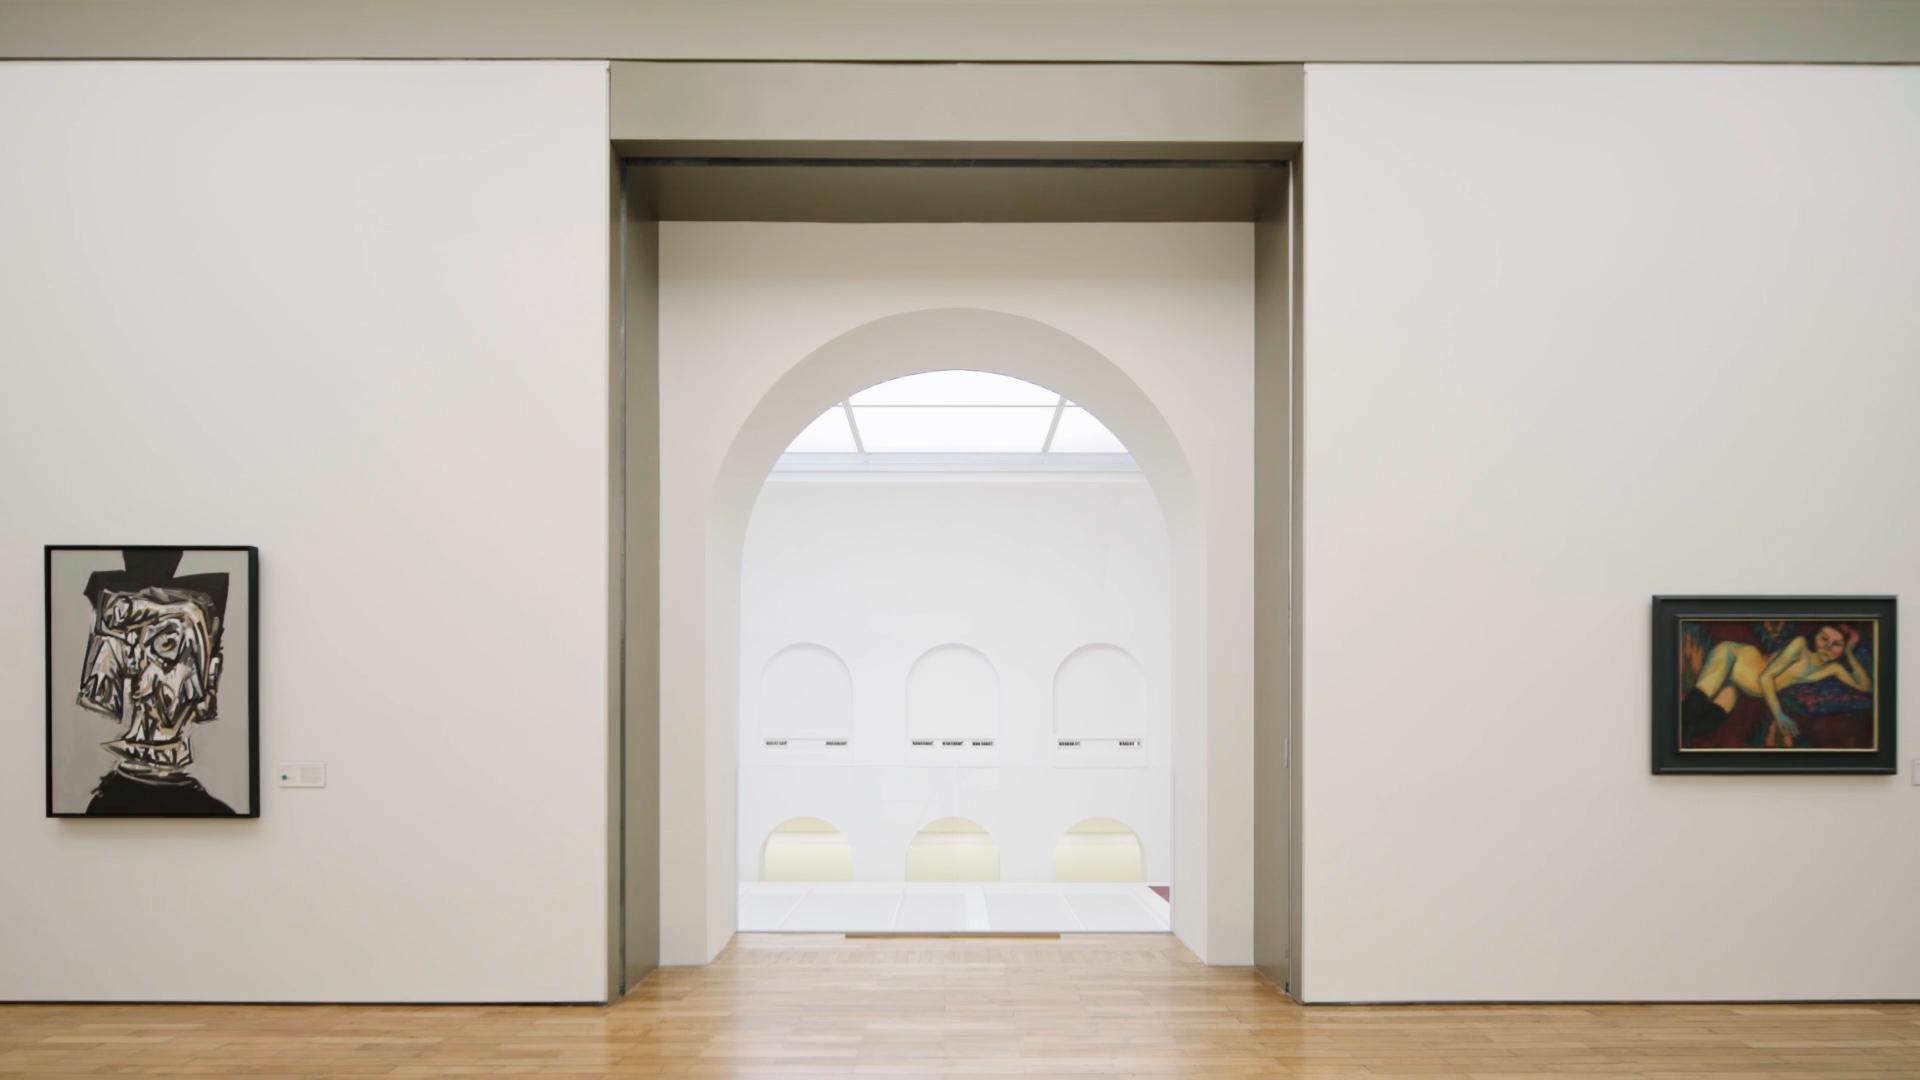 Musee d'arts de Nantes - Stanton Williams.mp4.00_02_49_18.Still016.jpg